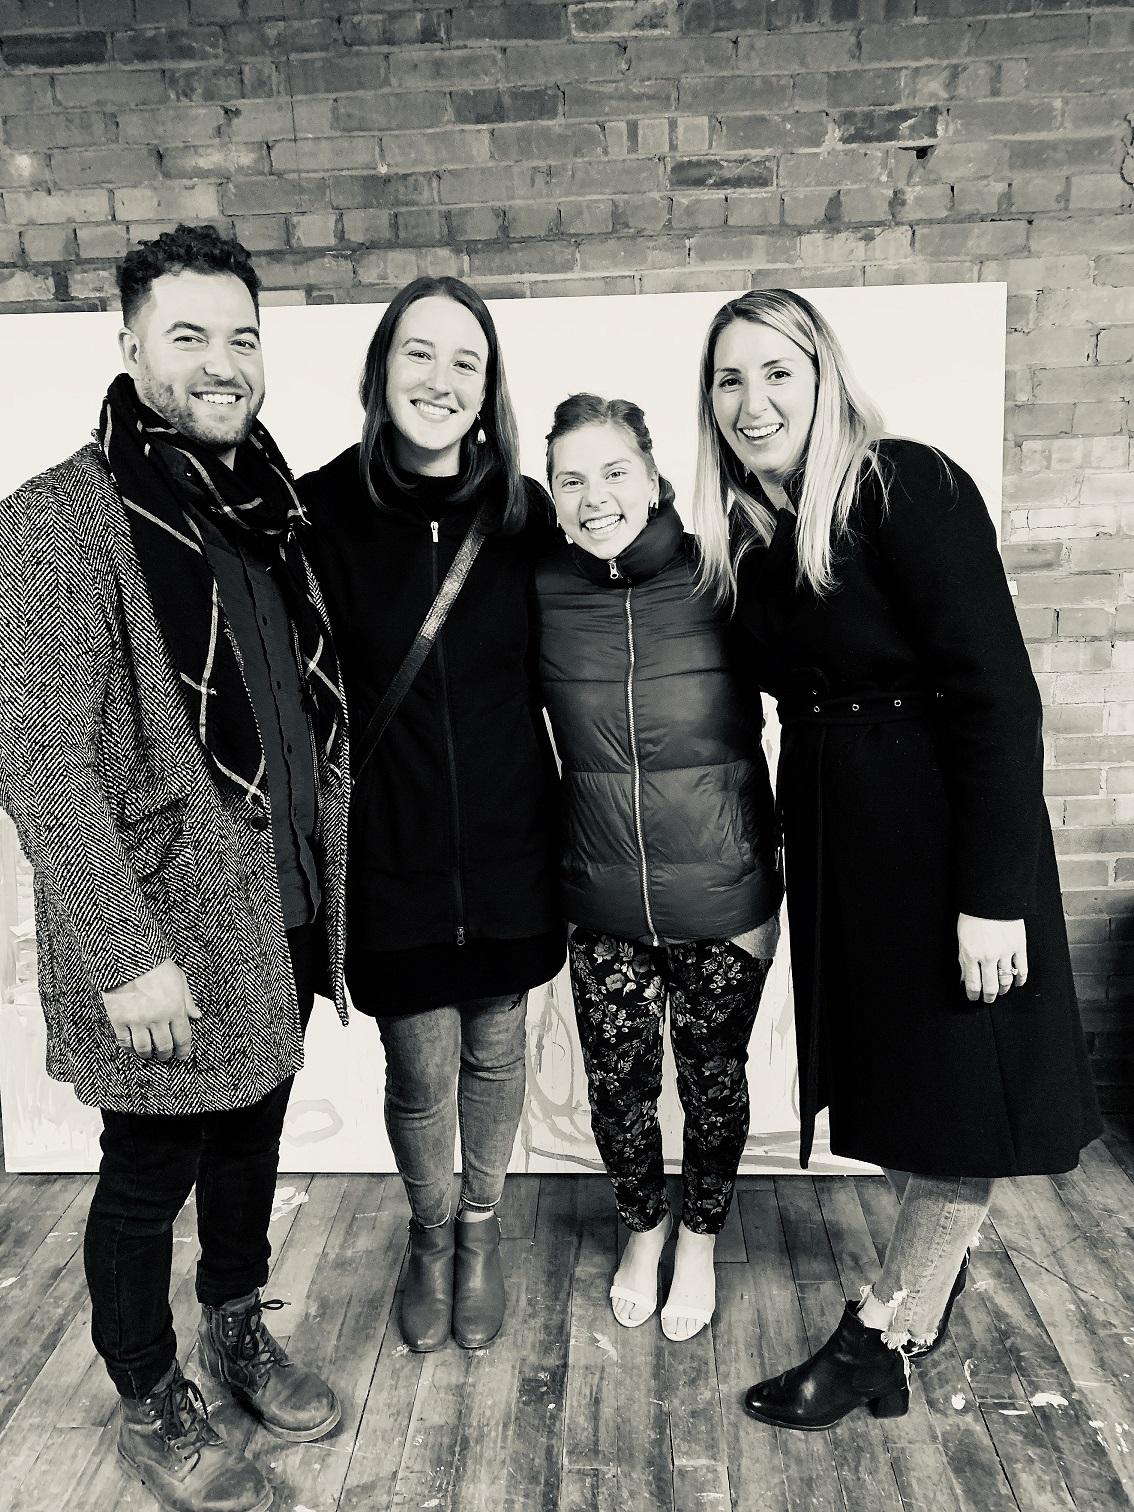 Gifting of KIAM studio to Abby and Ahmri. From left to right Kiel WIlson Ciocci Ahmri Vanderborne Abby Nowakowski Amanda Copy